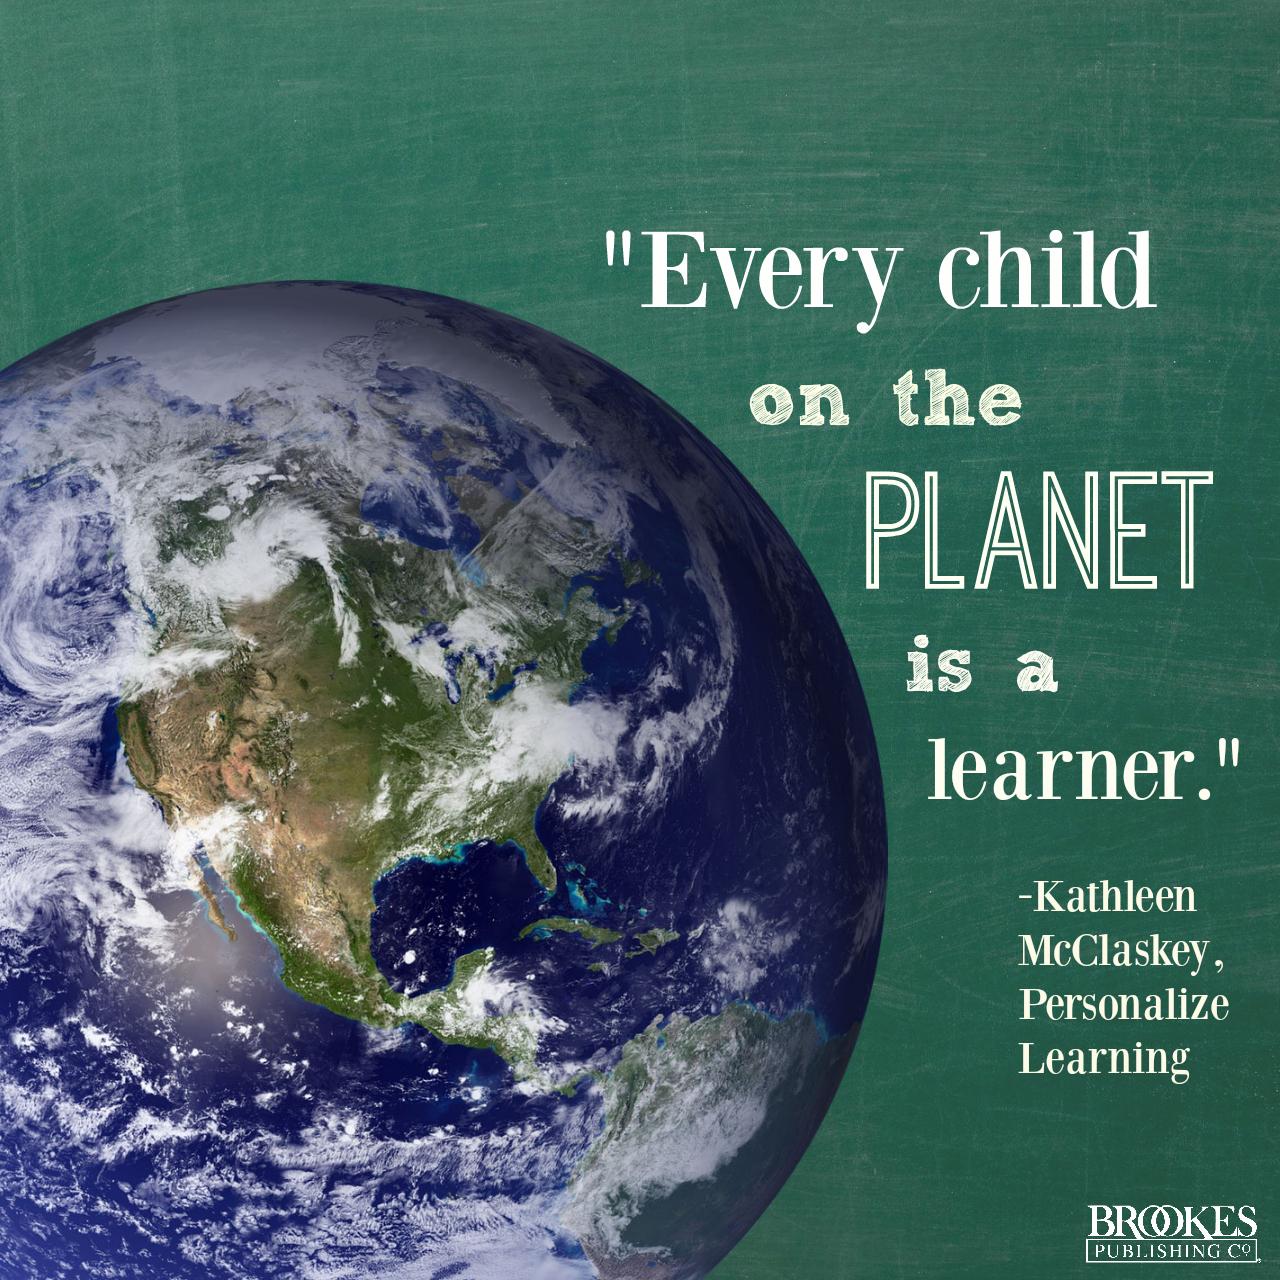 Kathleen McClaskey personalized learning